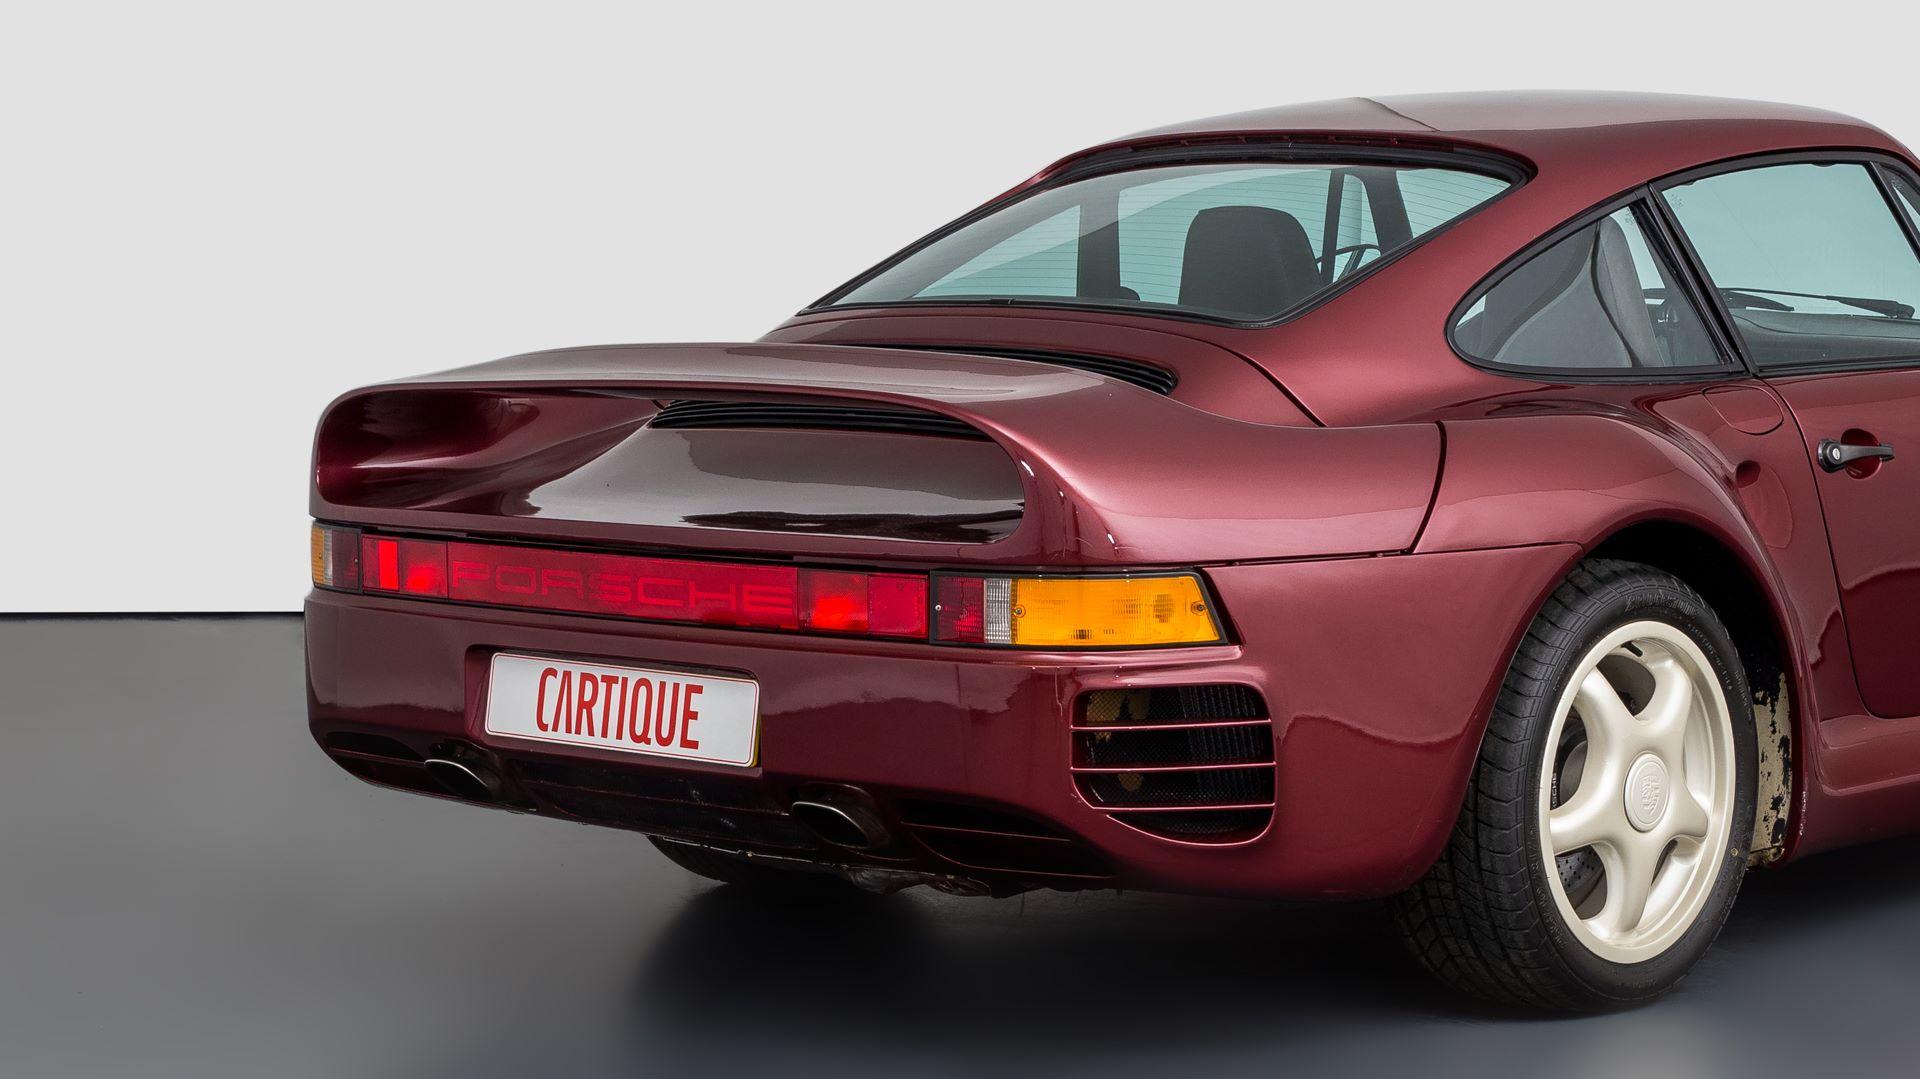 Porsche-959-Prototype-1985-for-sale-5